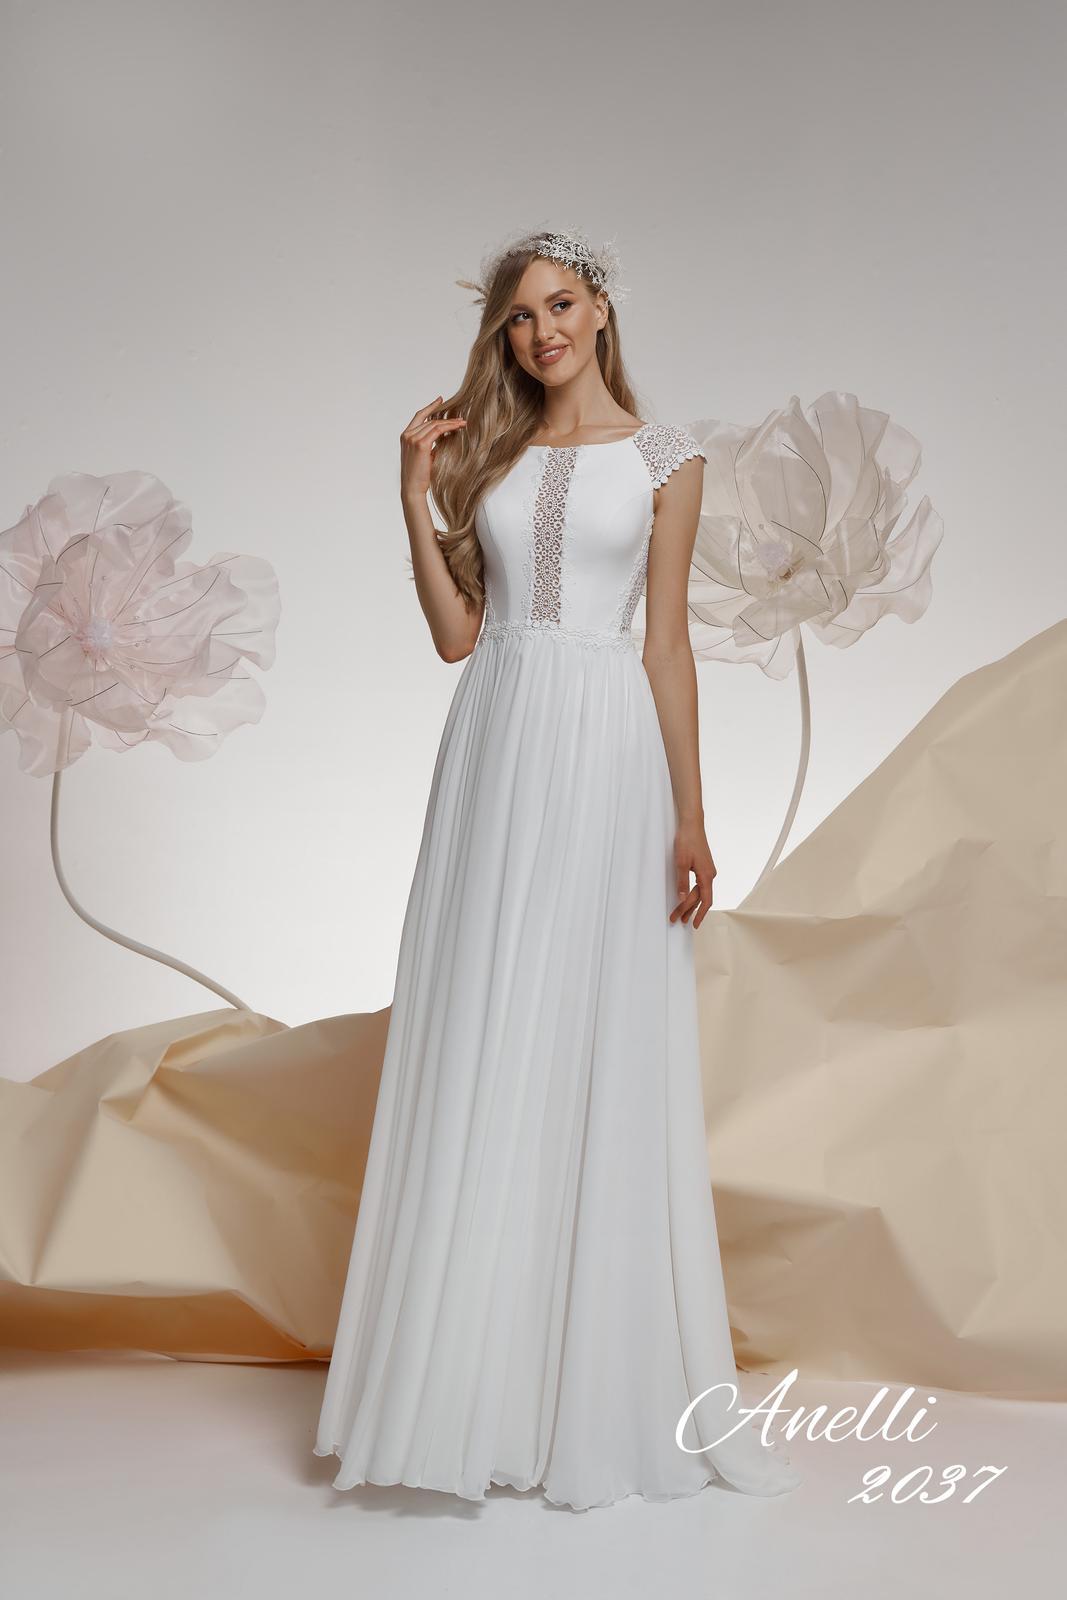 Svadobné šaty - Imagine 2037 - Obrázok č. 1